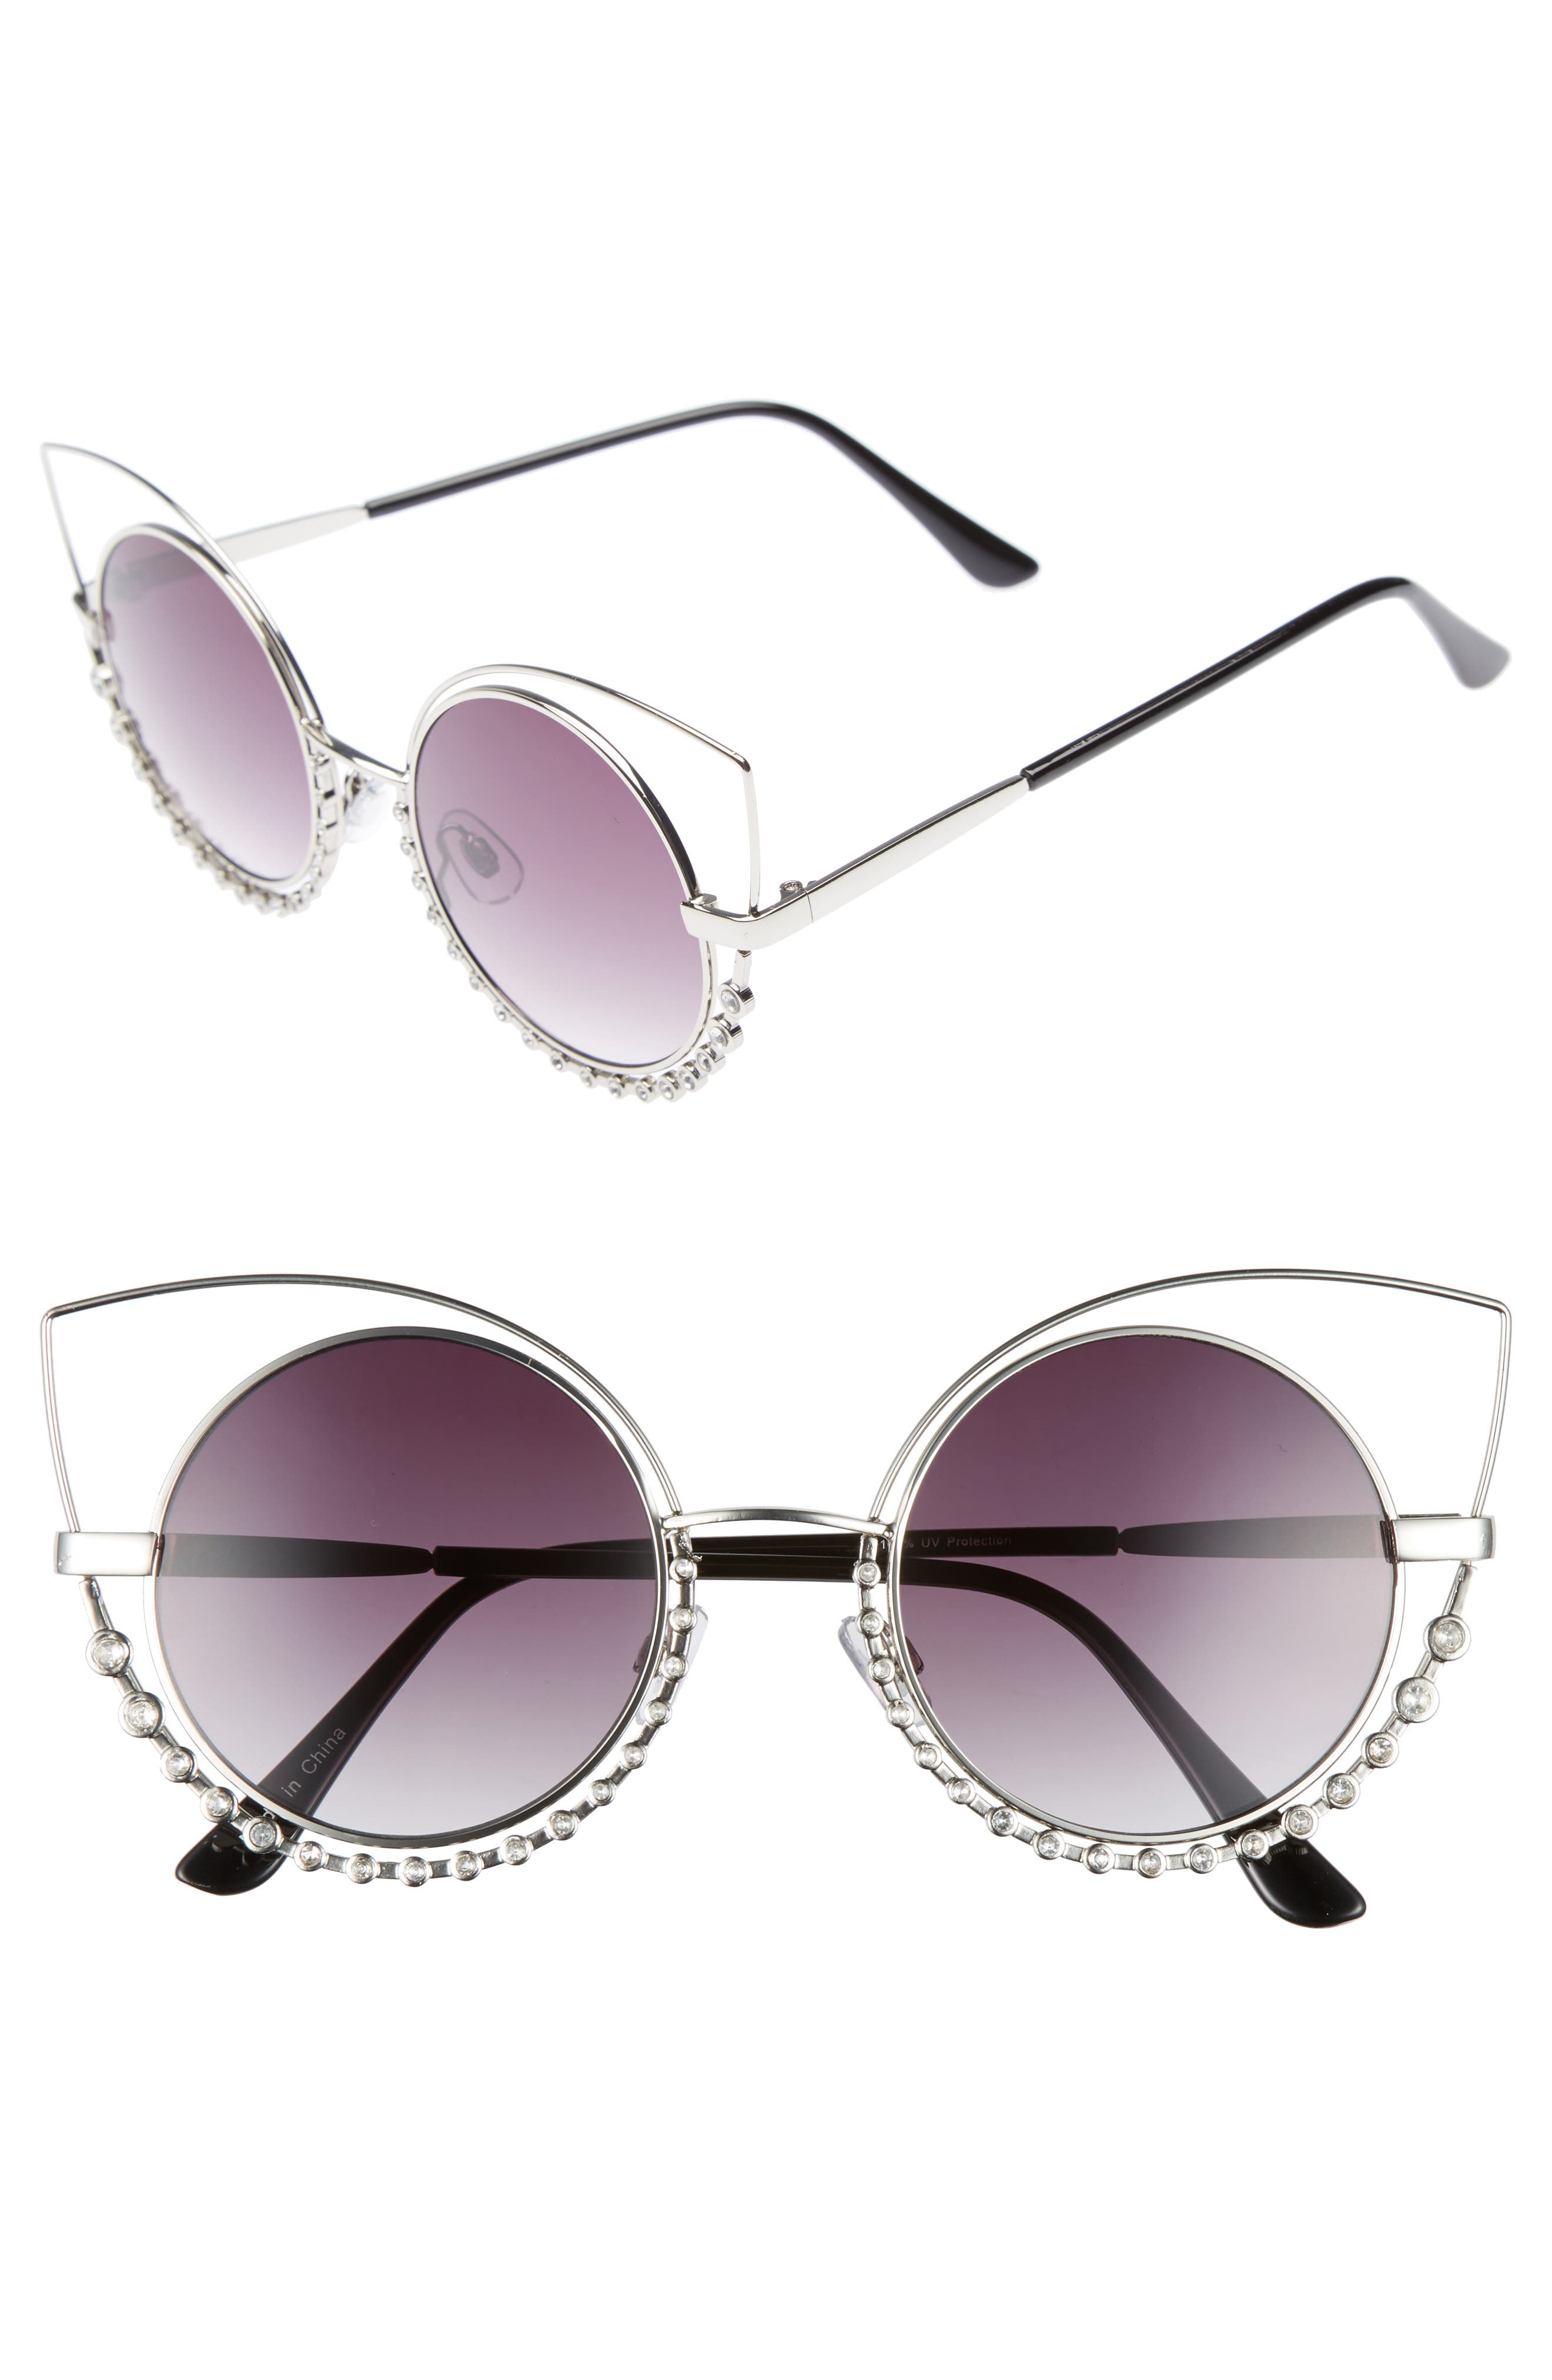 Main Image - BP. 55mm Studded Round Sunglasses